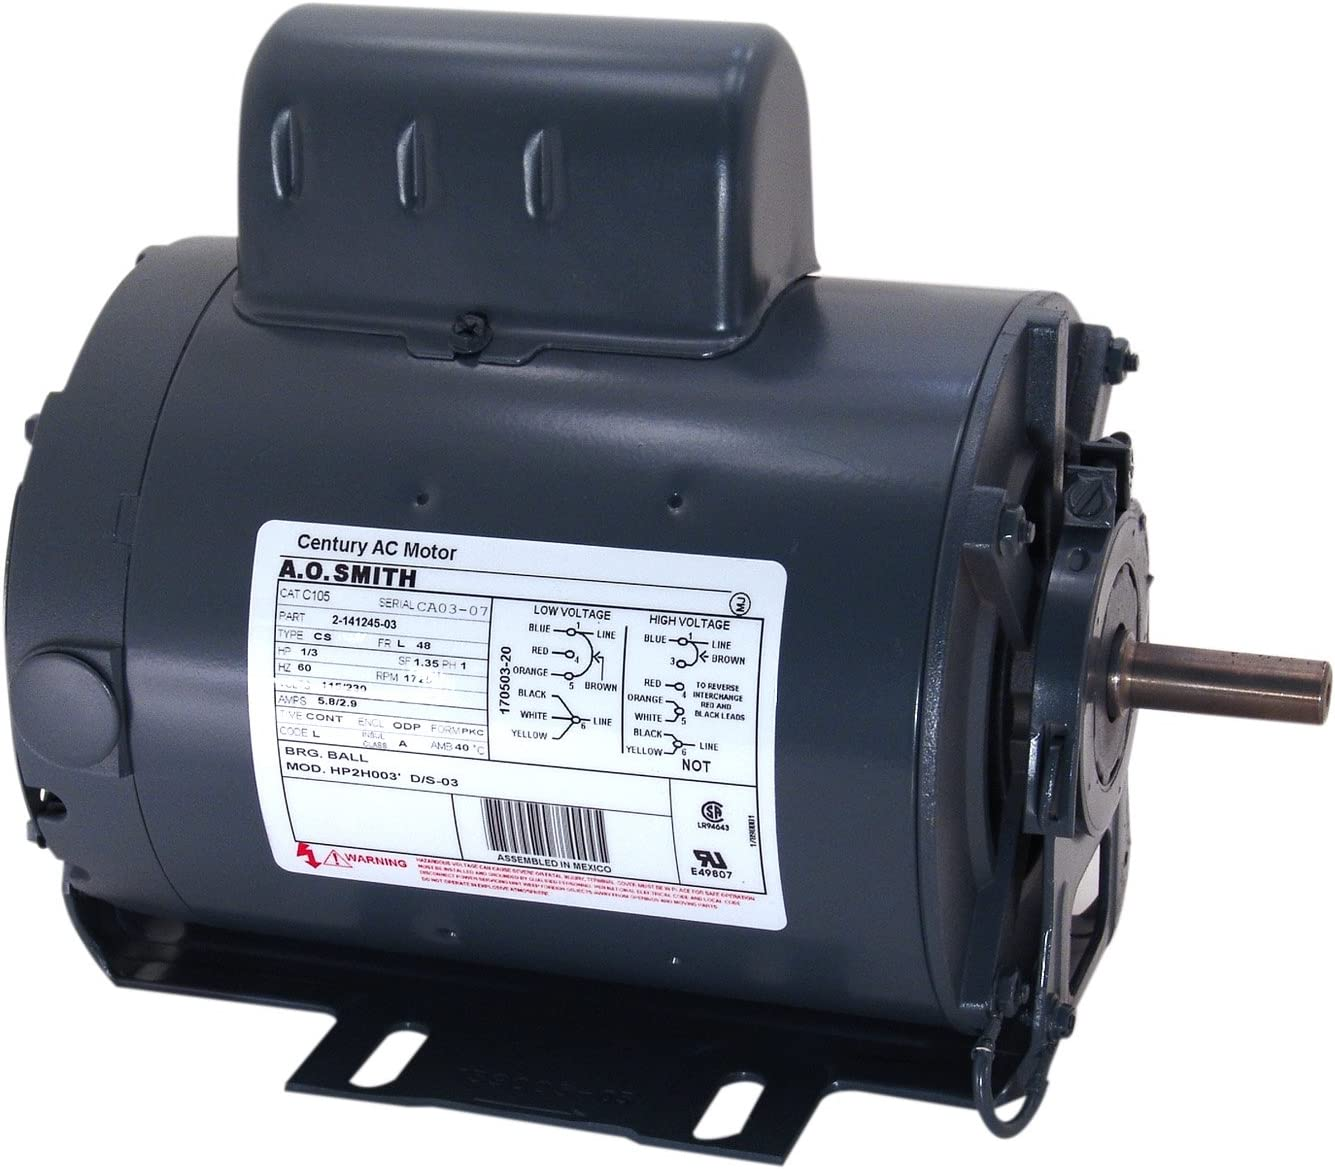 A.O. Smith C196L 1/4 HP, 1725 RPM, 115/230 Volts, 48 Frame, ODP Enclosure, Ball Bearing Capacitor Start Motor